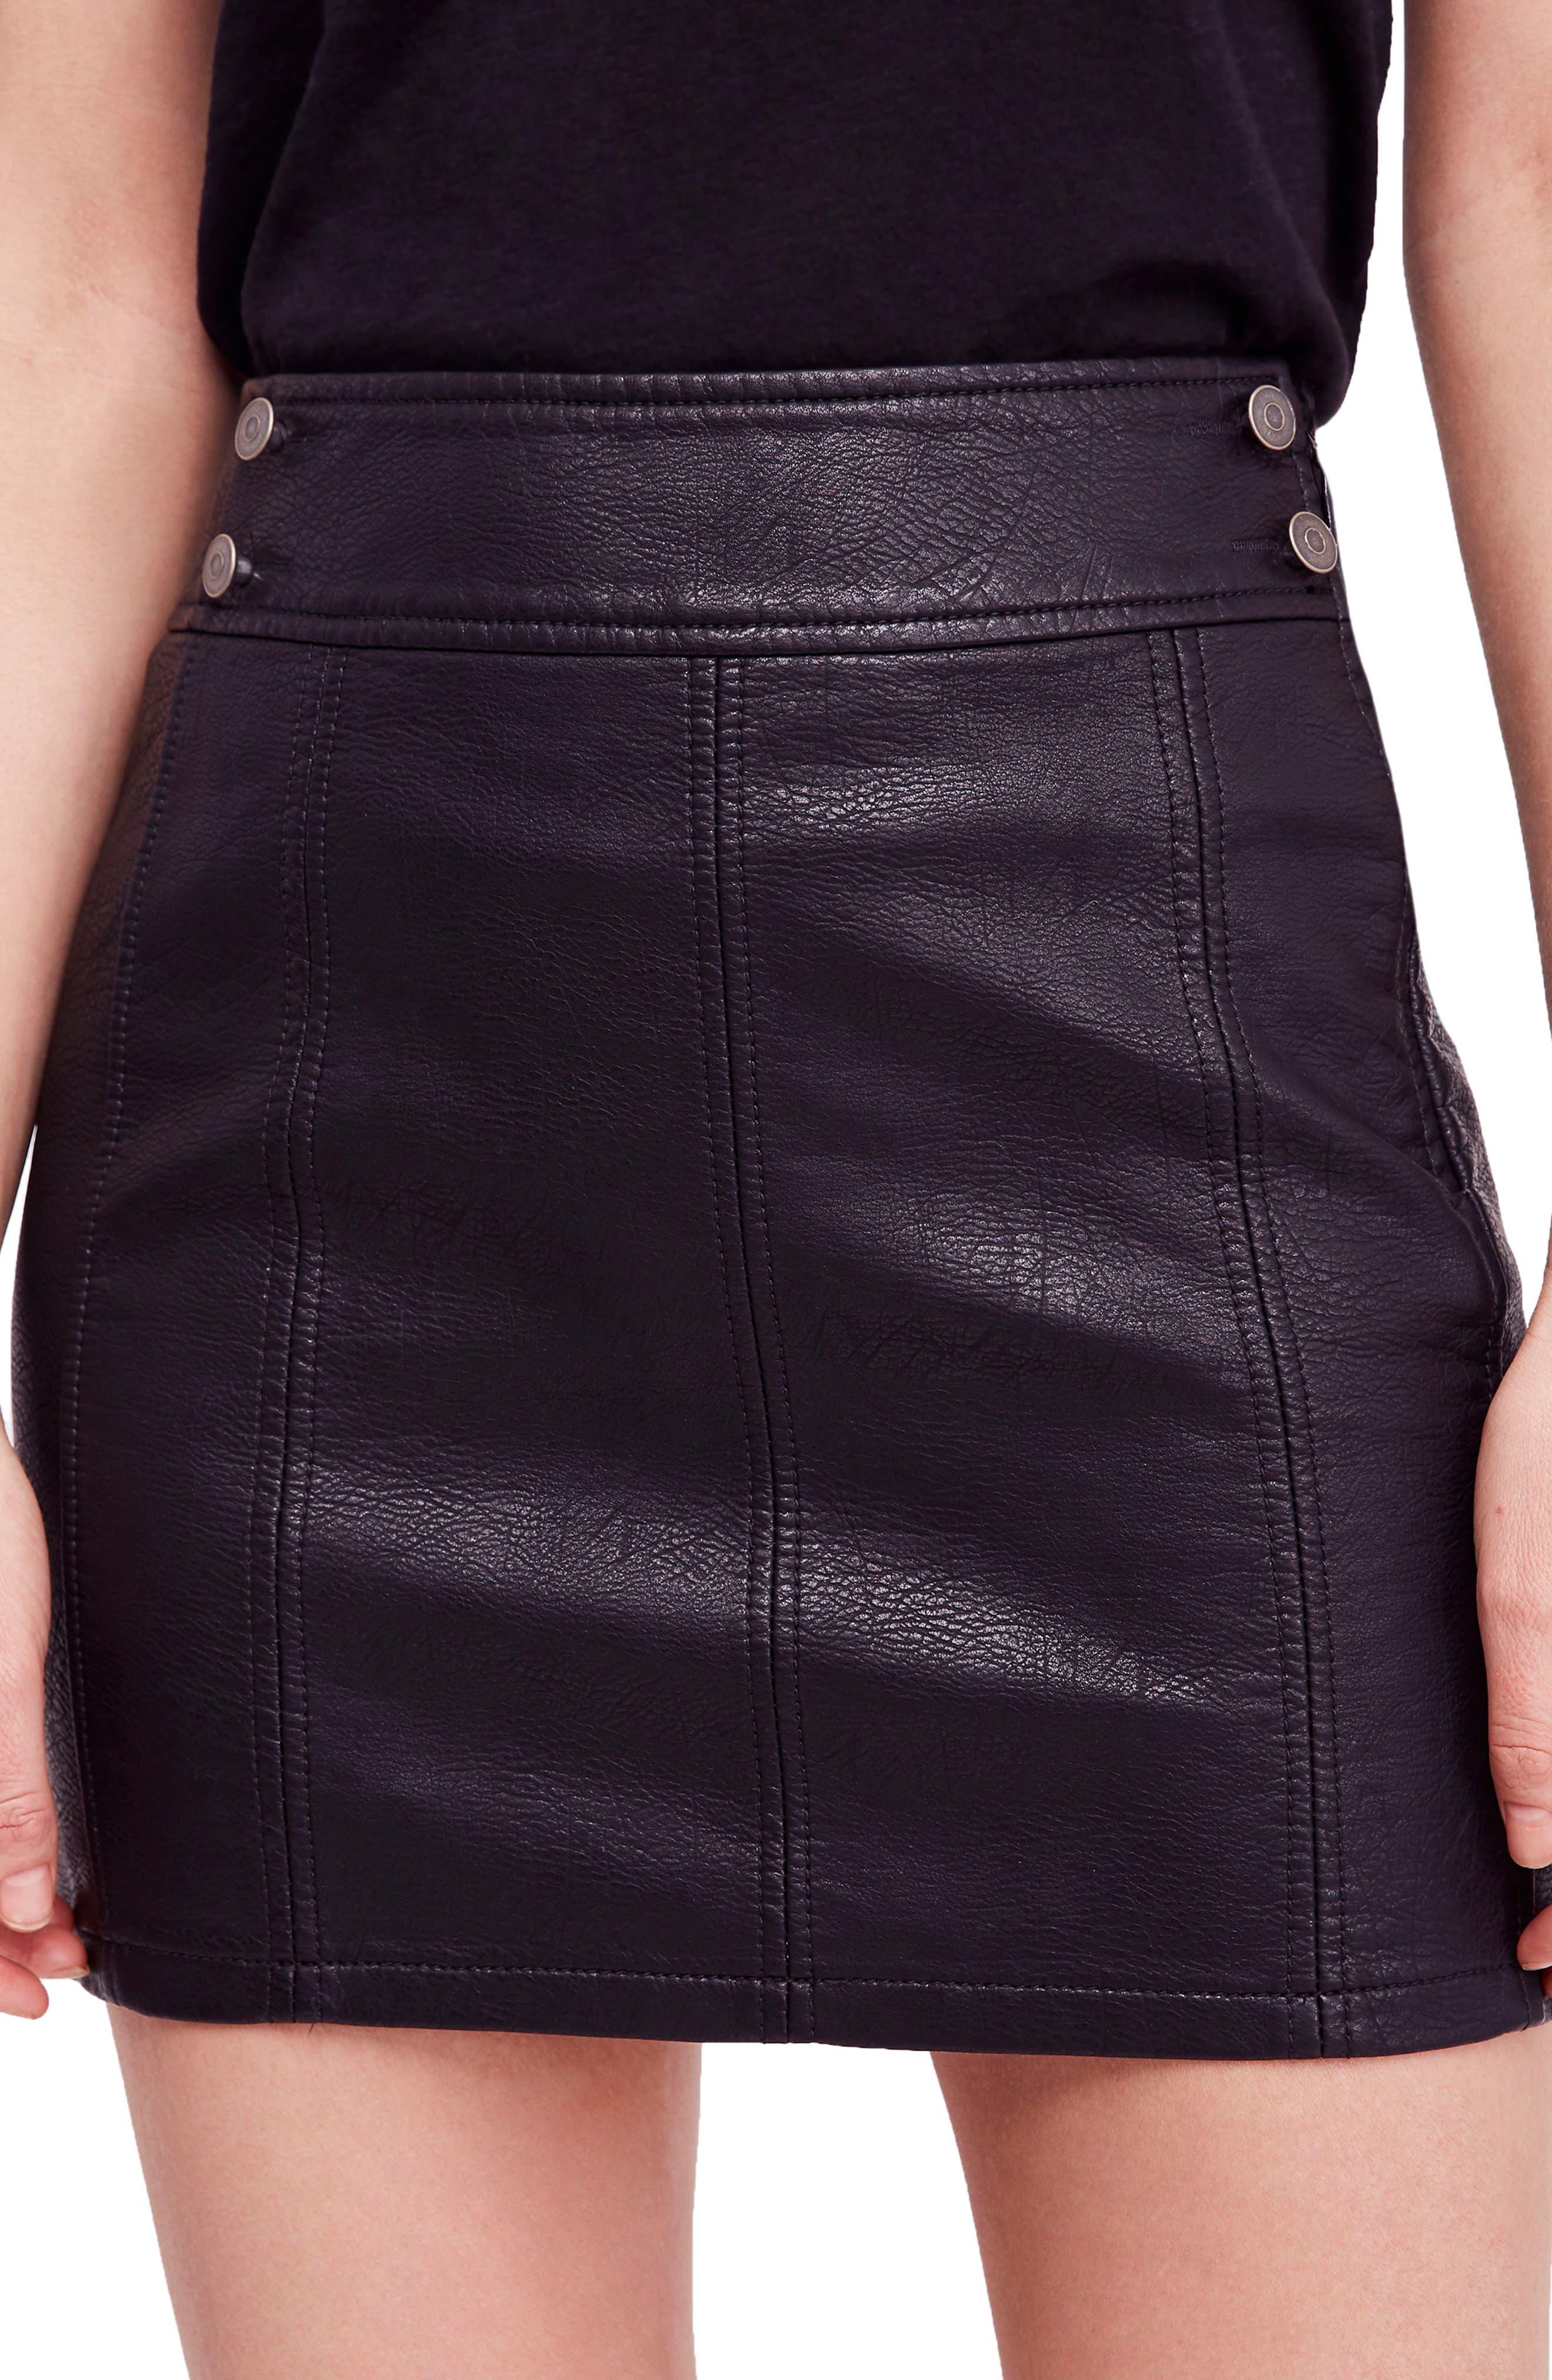 Free People Retro Faux Leather Body-Con Miniskirt, Black